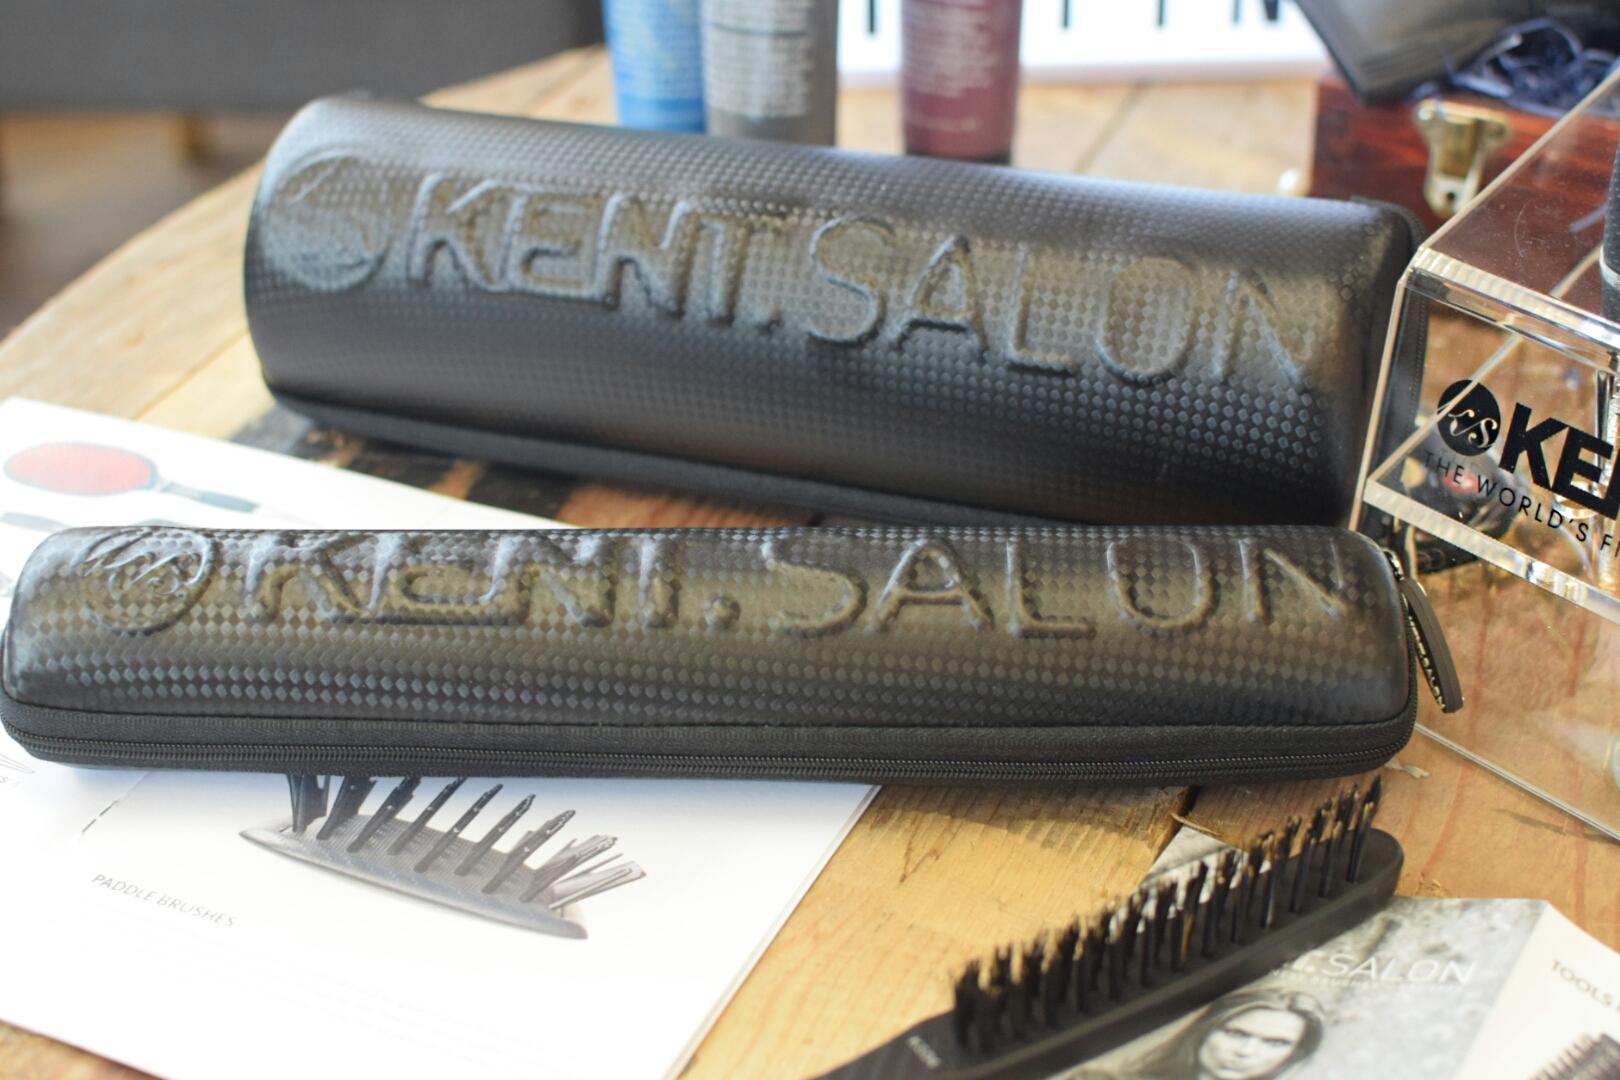 Kent brushes